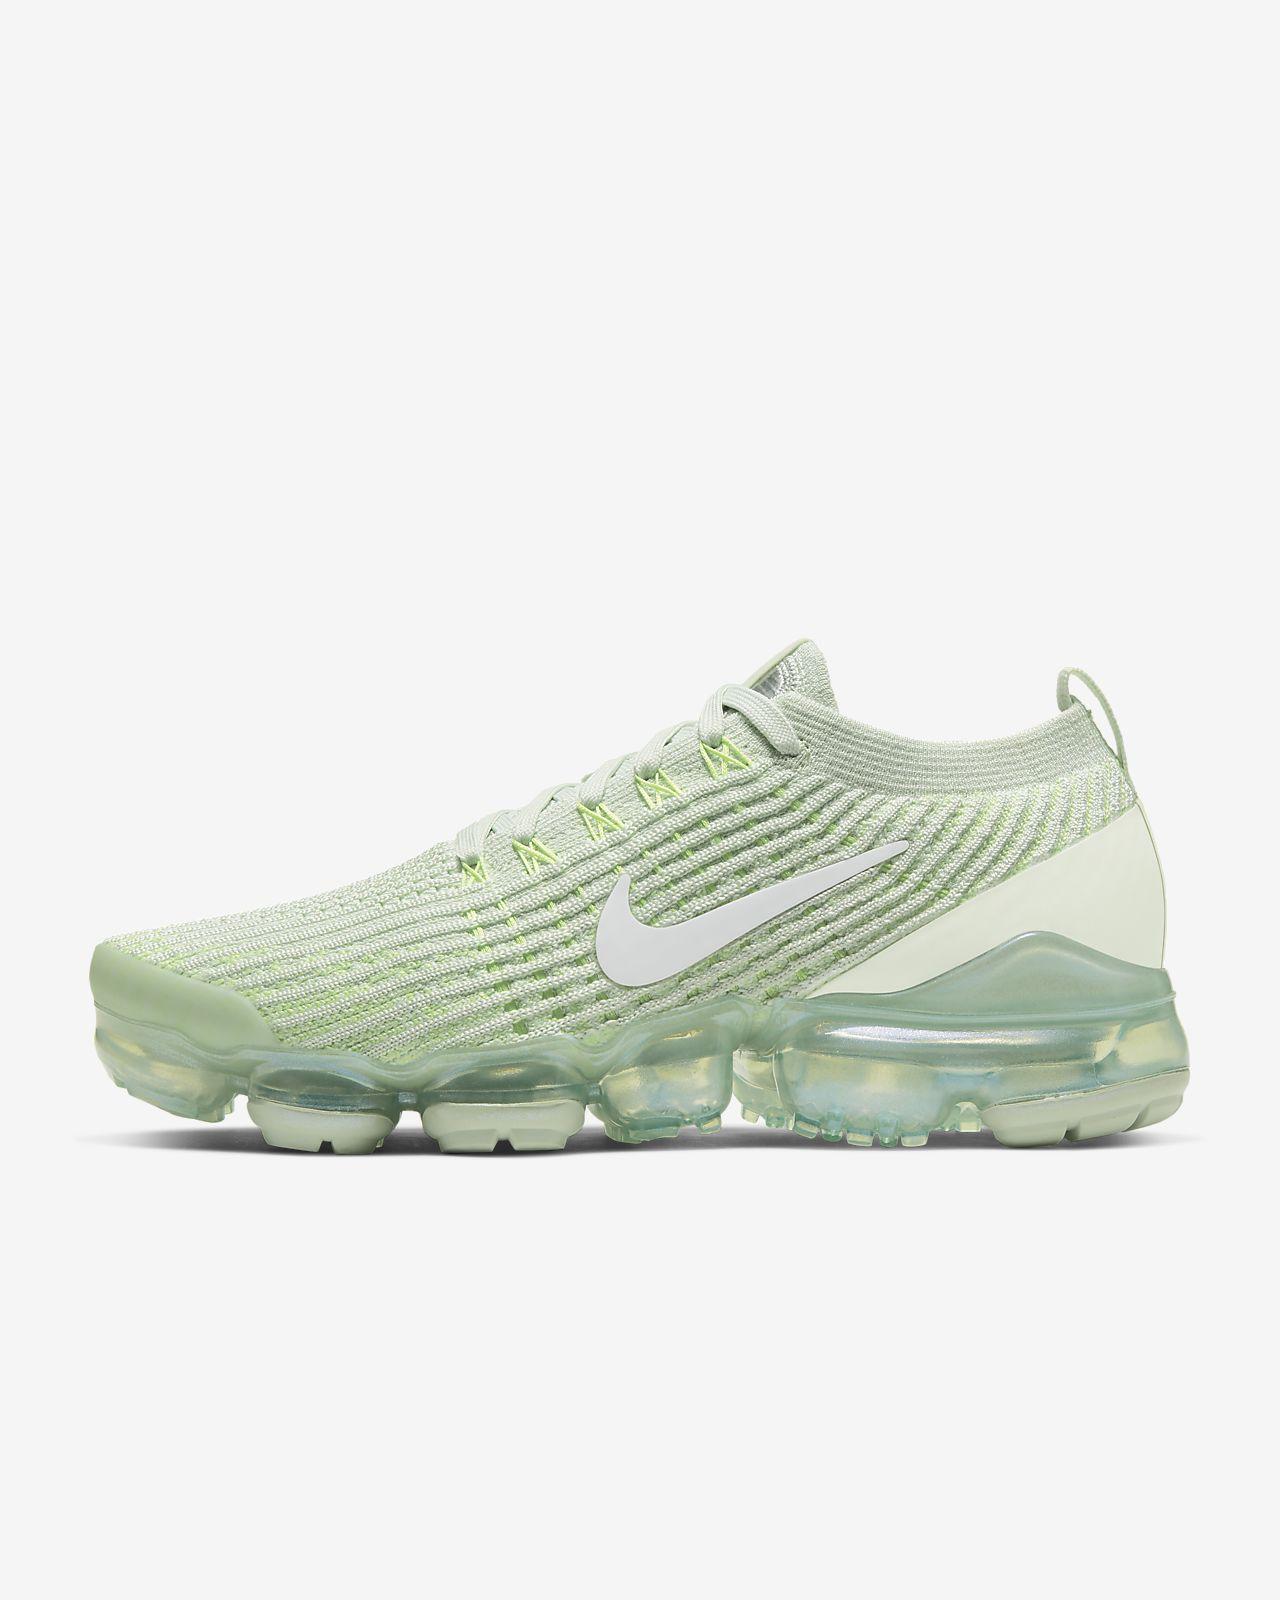 UOMO NUOVO ORIGINALE Nike Shox Gravità Scarpe Taglie: 8 14